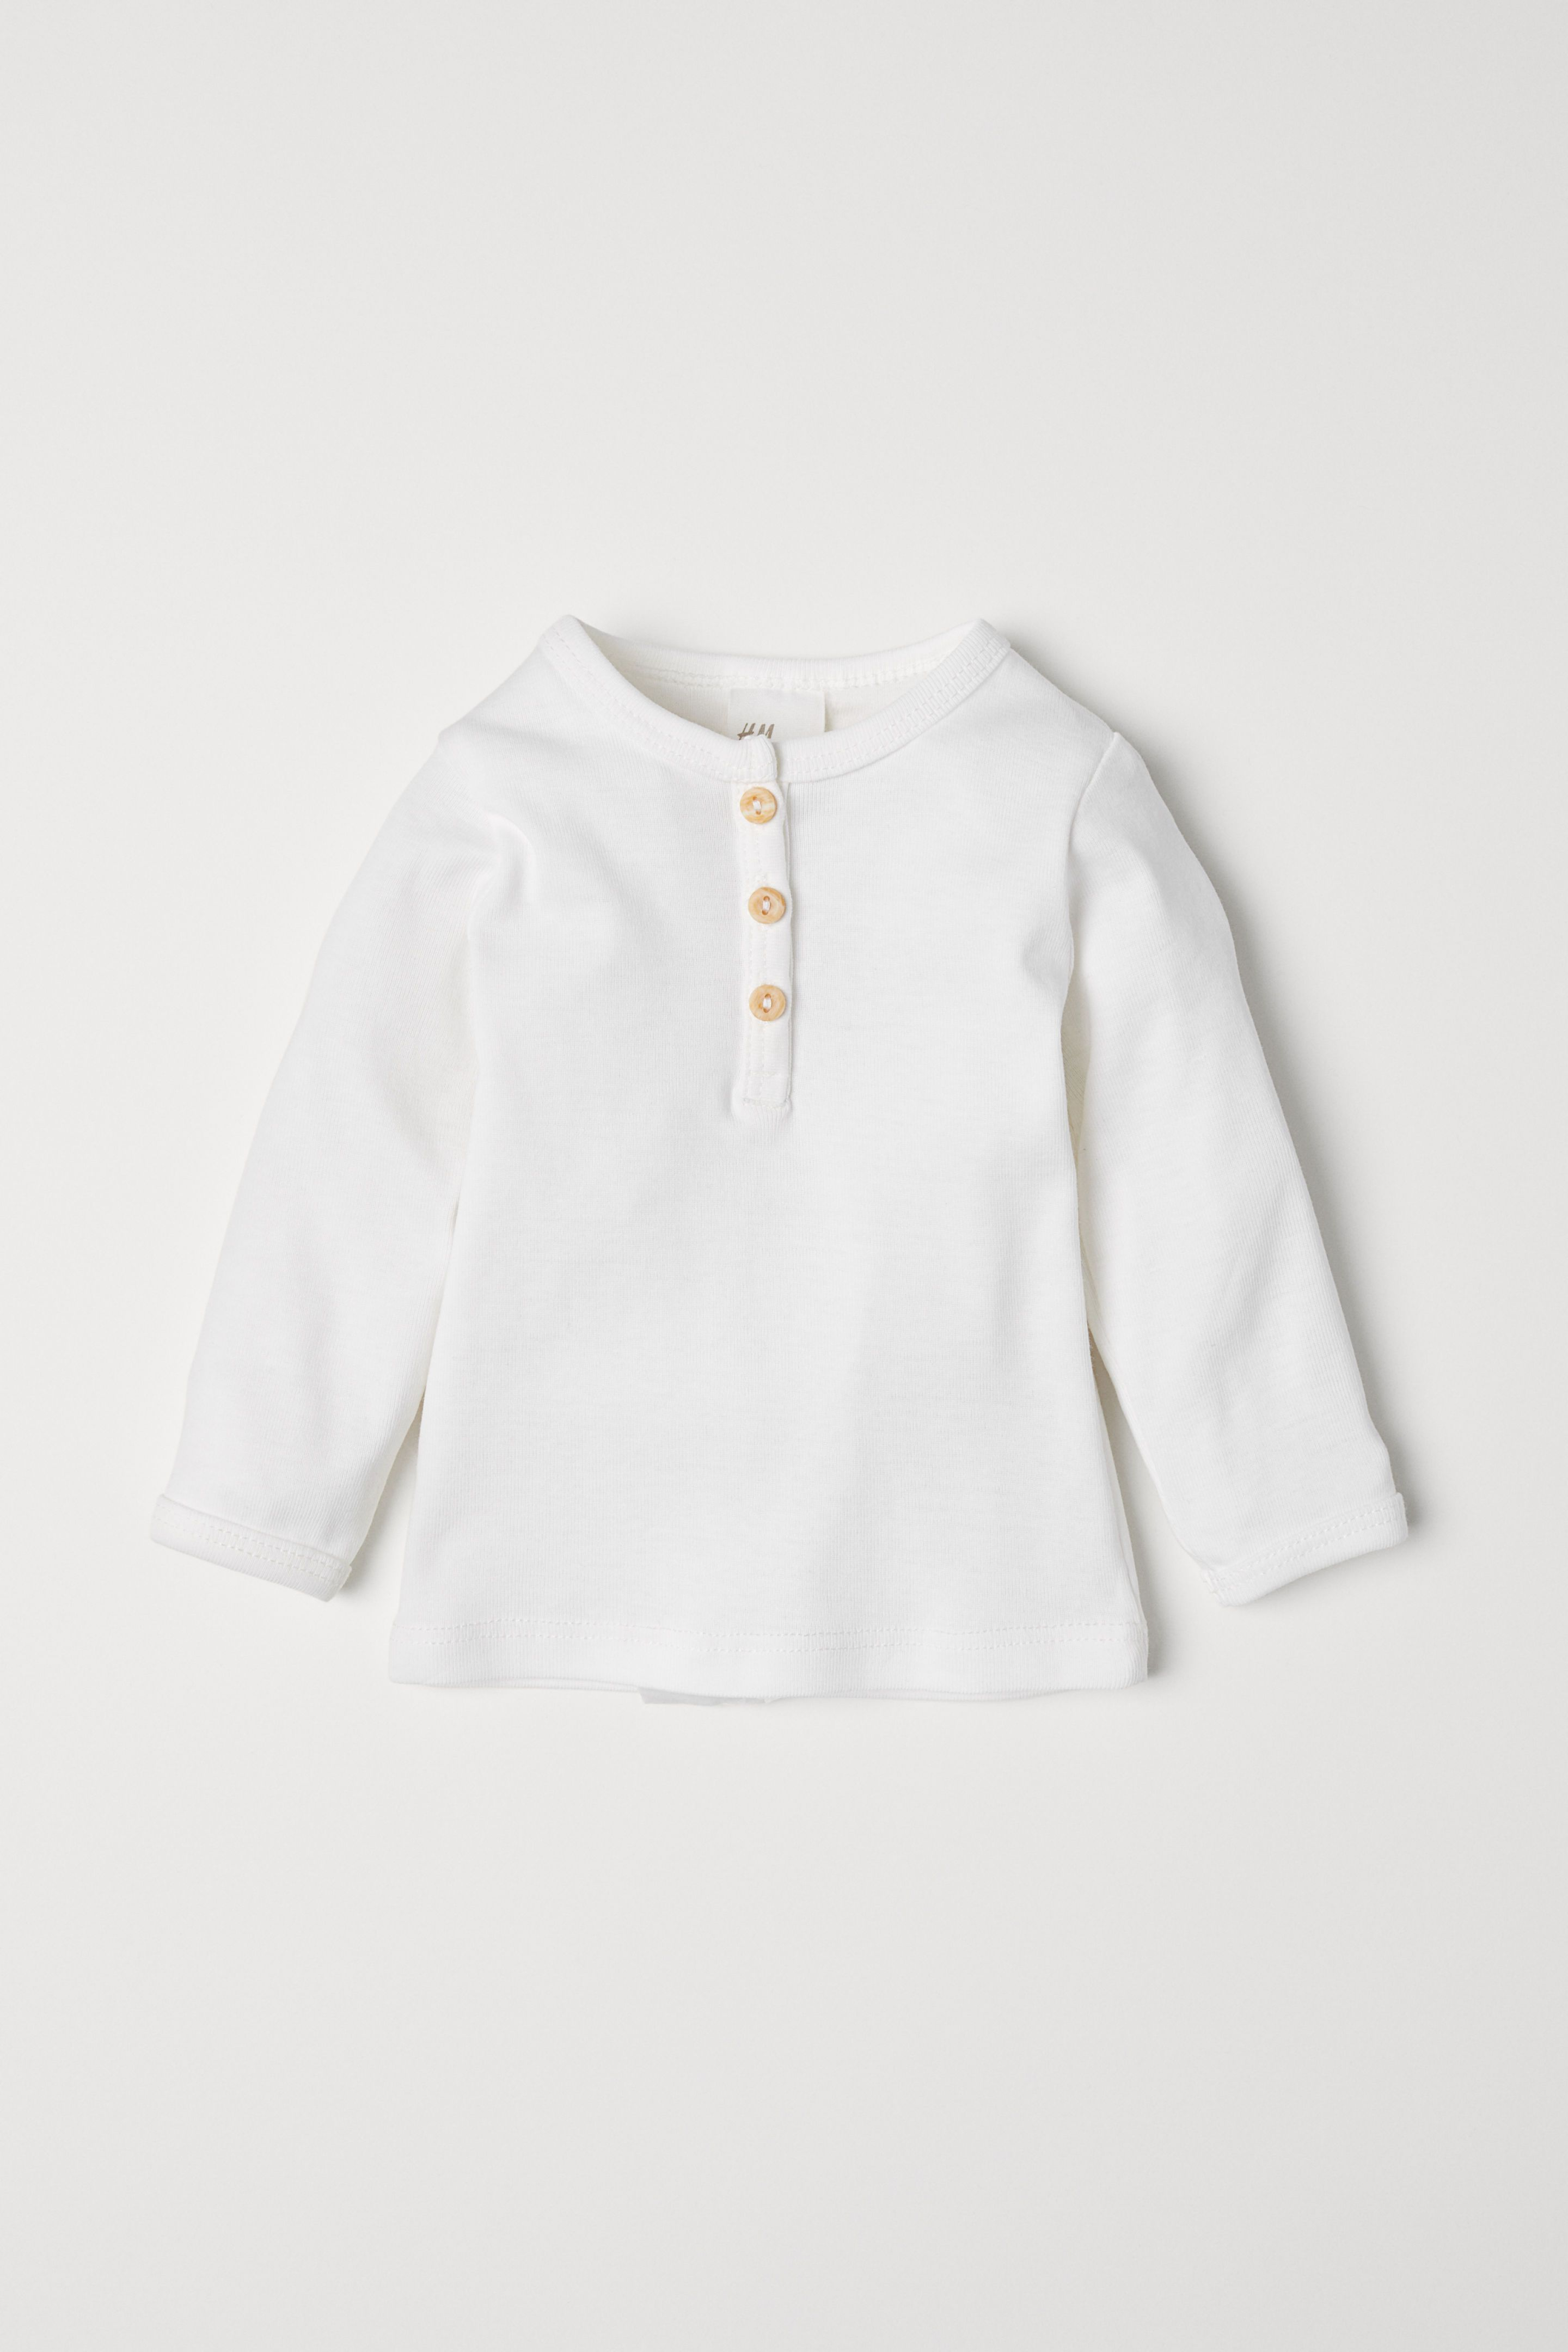 70653215fcd84 Cotton Henley Shirt - White -